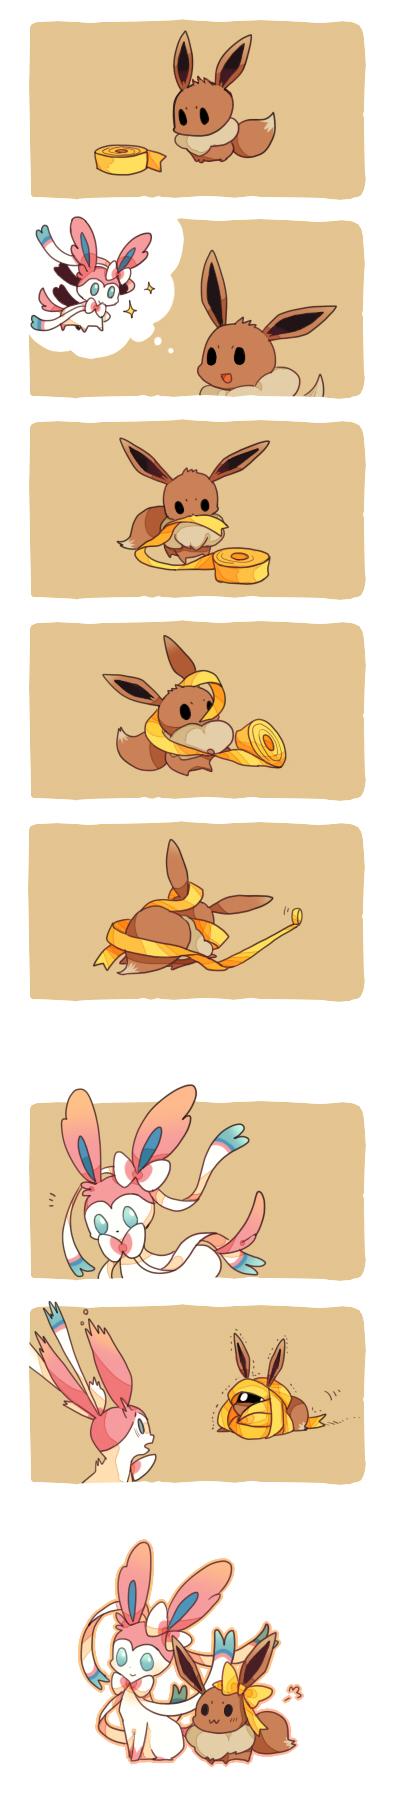 Tags: Anime, Roku Roku (Greentea66), Pokémon, Eevee, Sylveon, Humor, Humor Comic